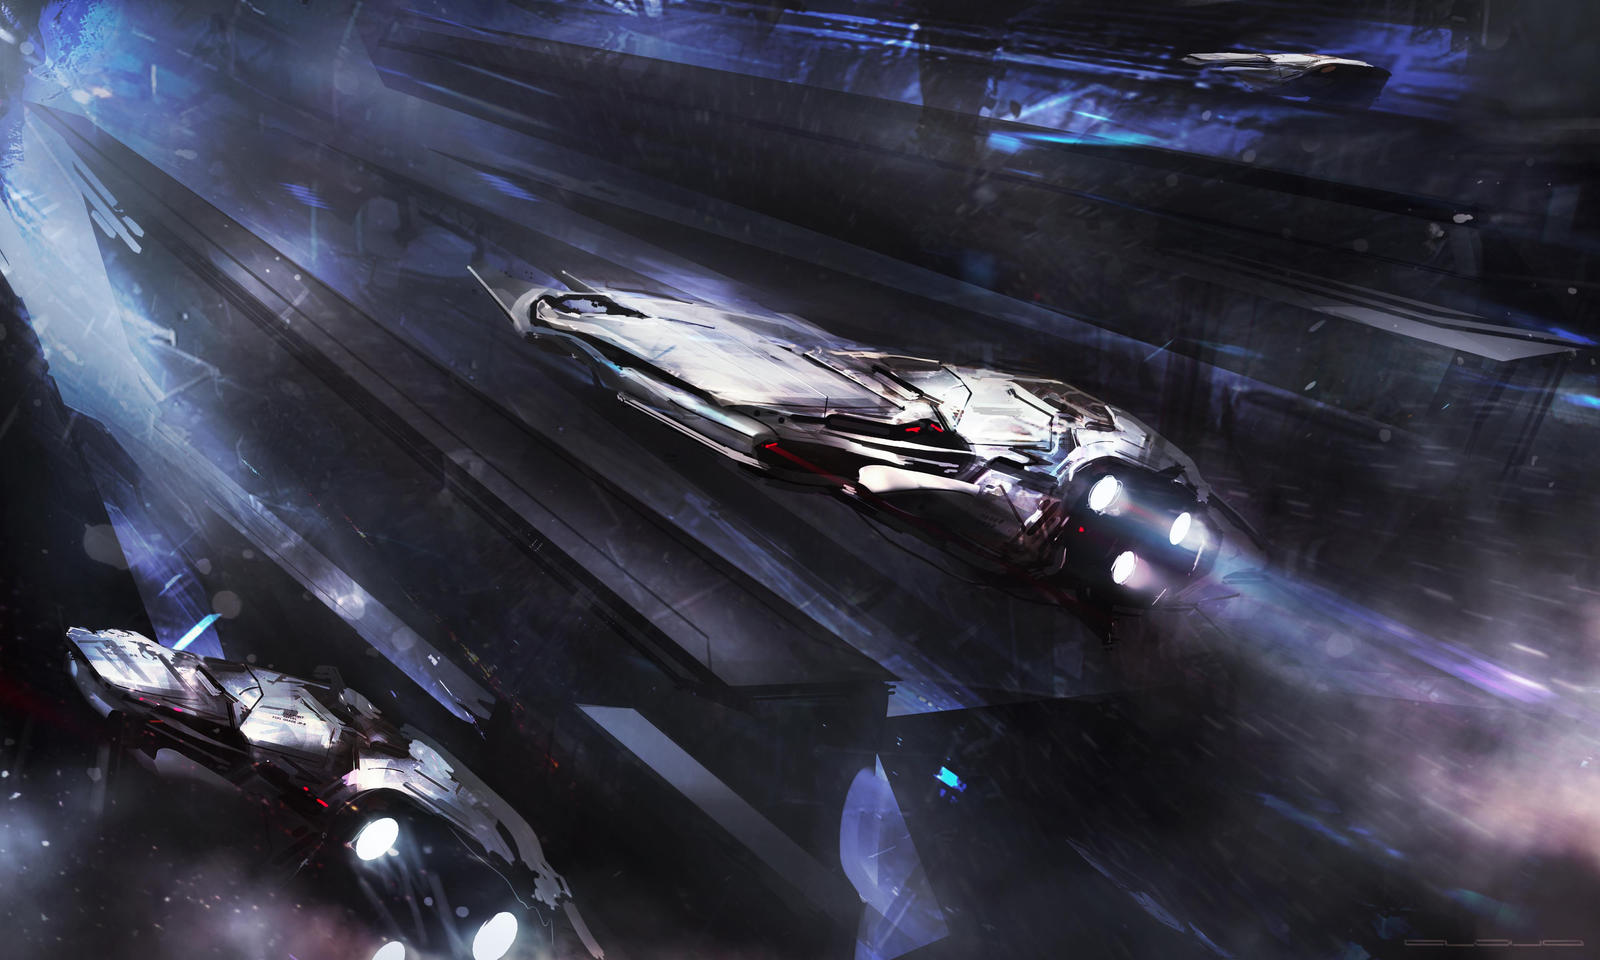 SPEED FINAL post by Darkcloud013